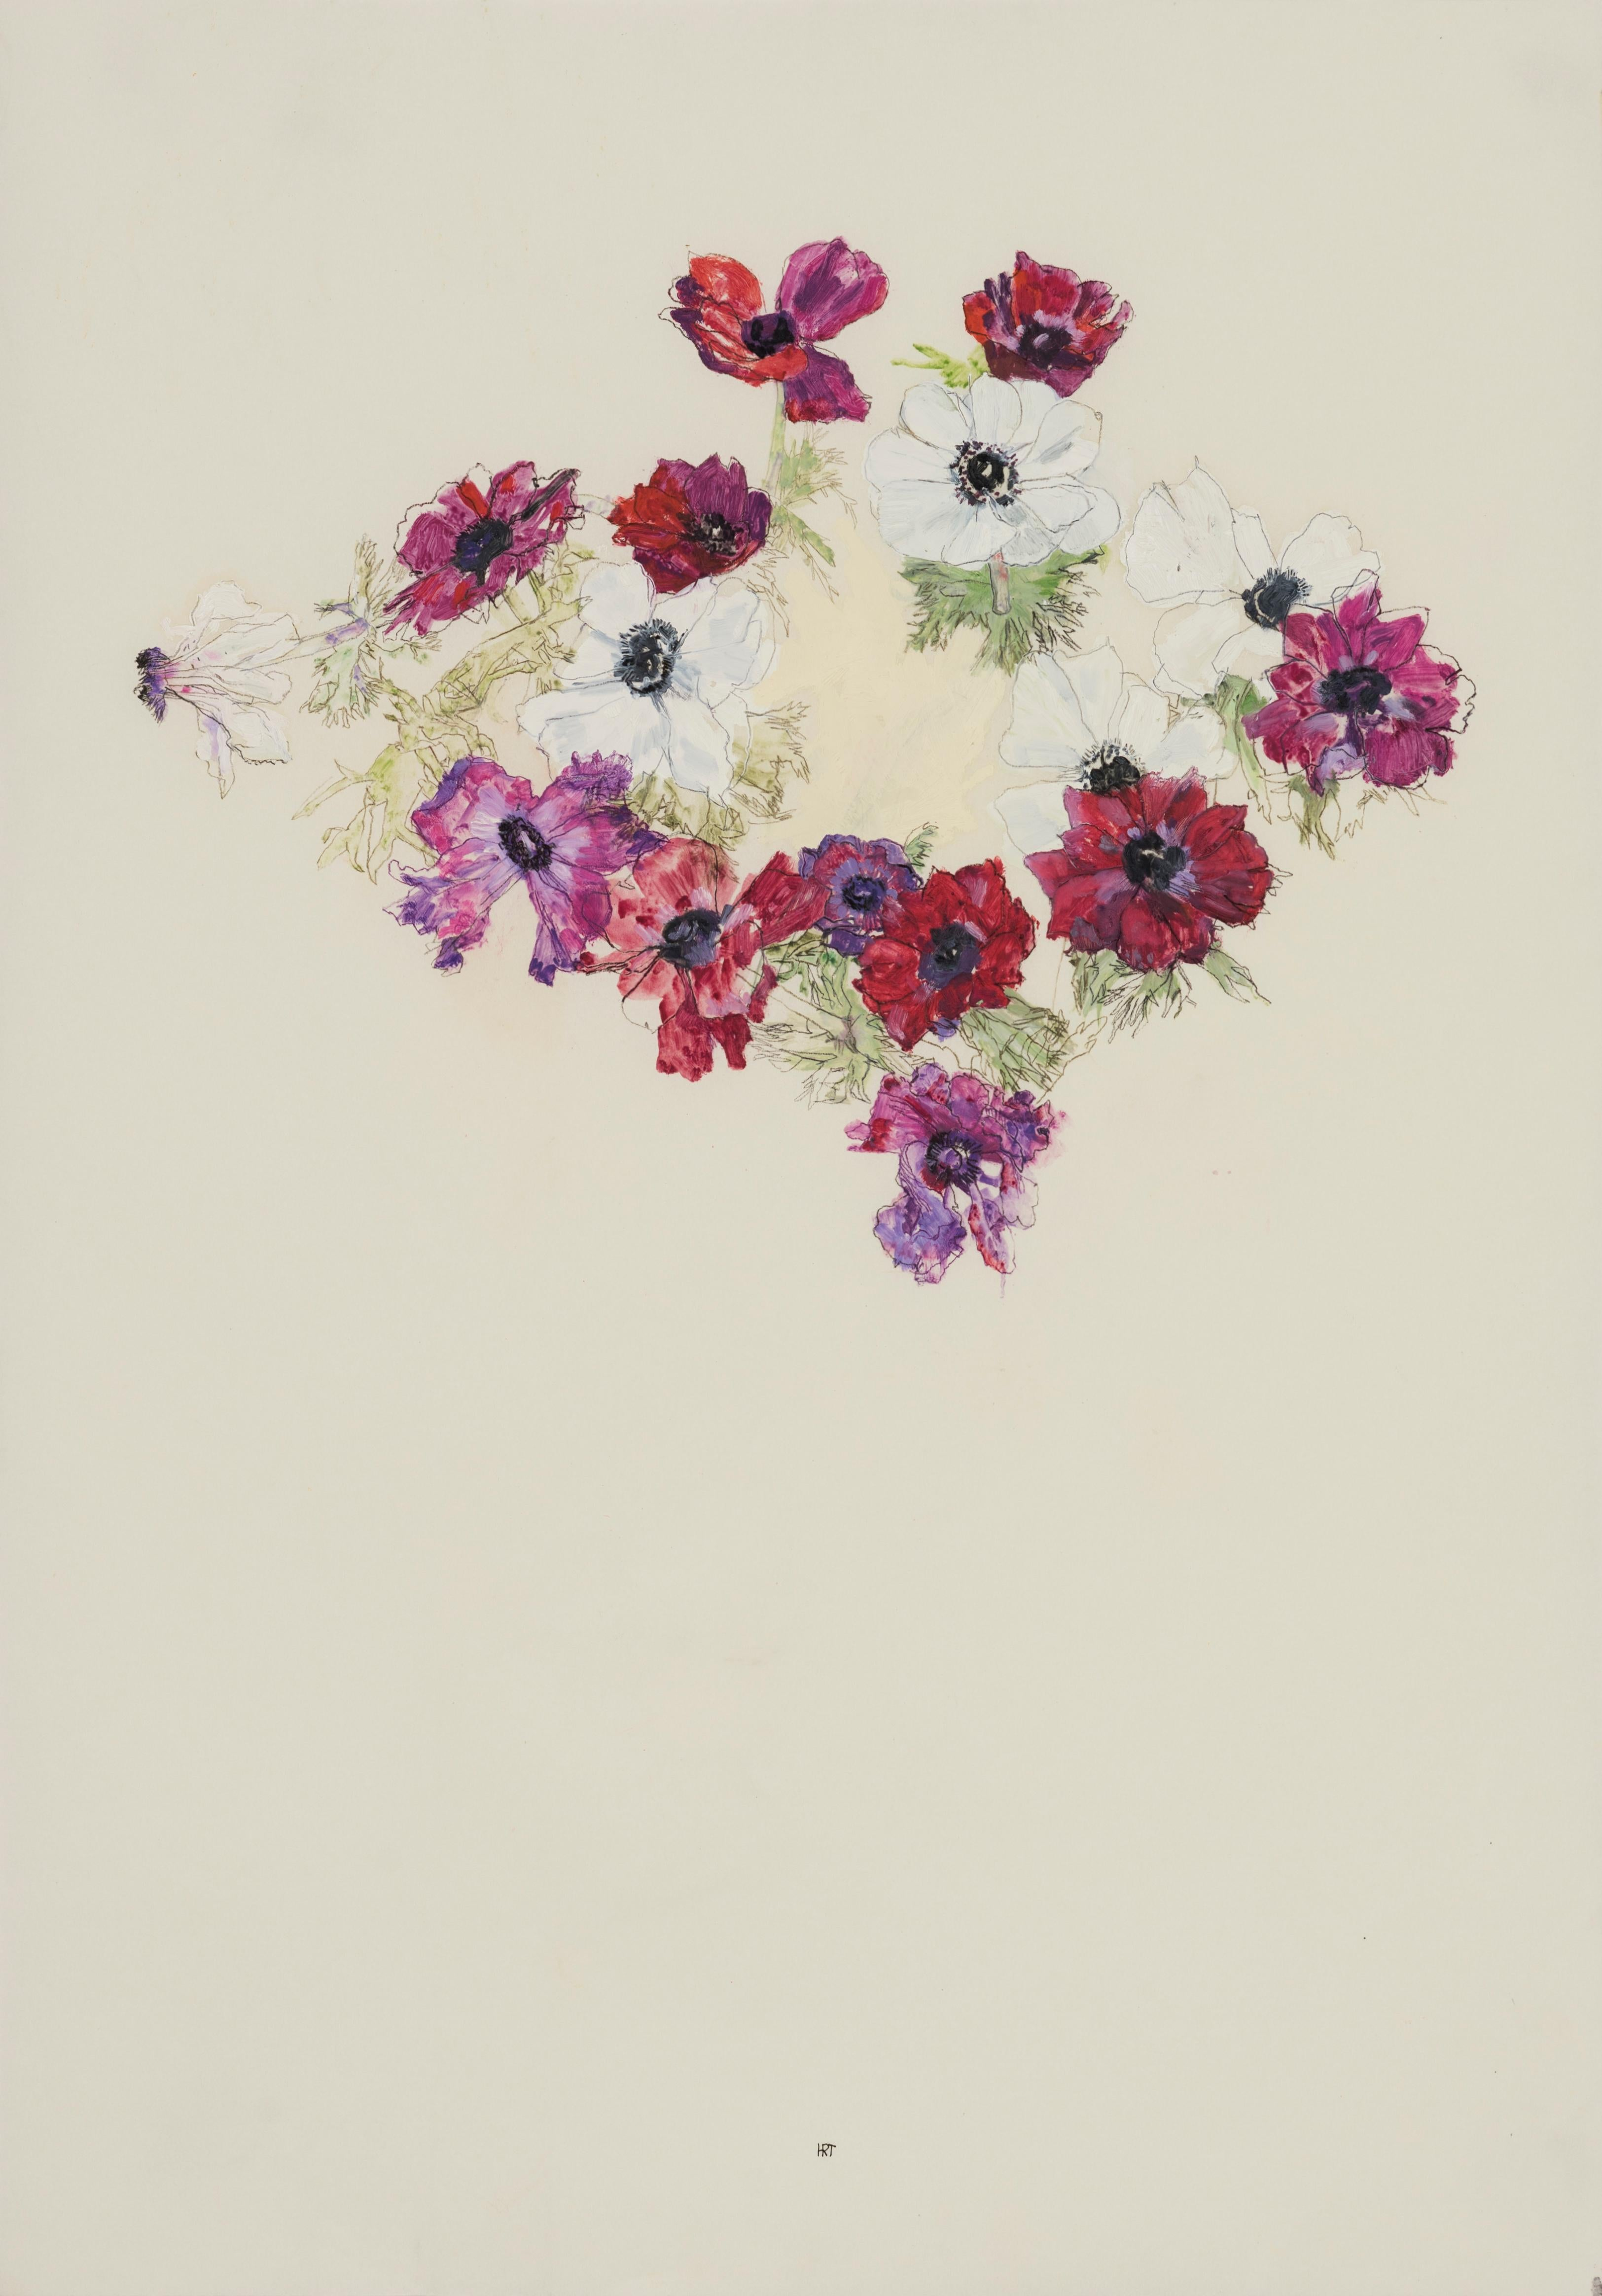 Flower Circle (Anemones), Mixed media on Pergamenata parchment